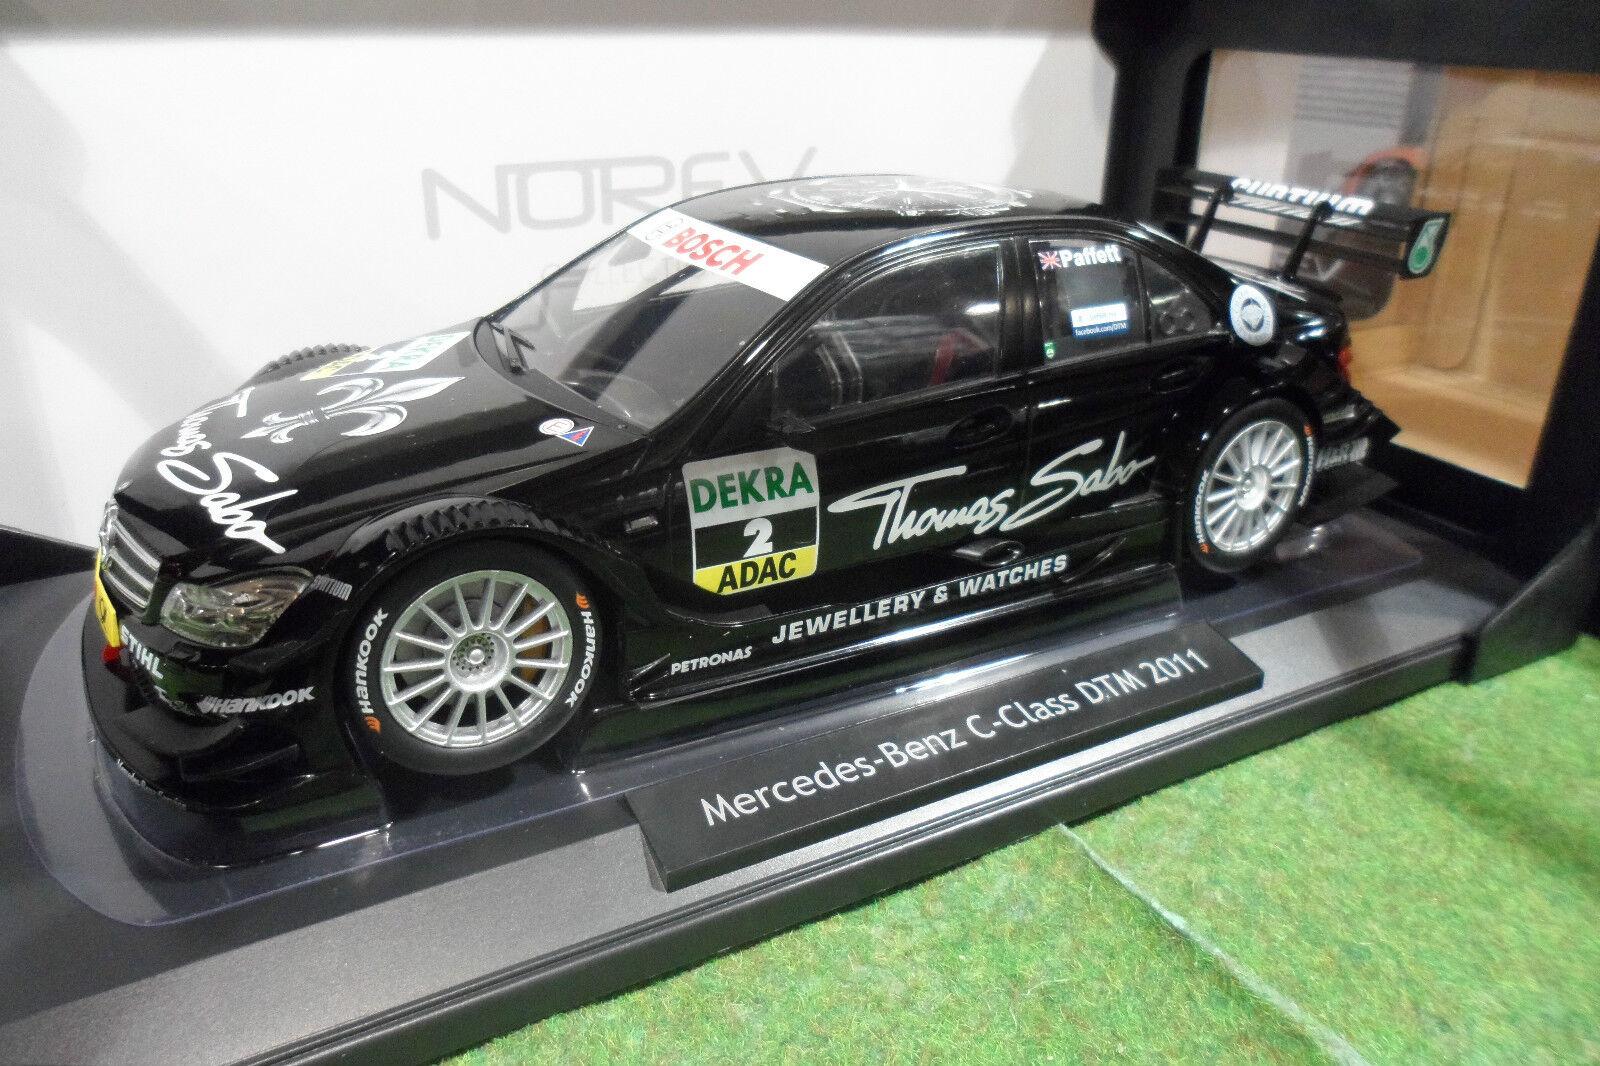 MERCEDES BENZ C-CLASS DTM 2011 G. Paffett au 1 18 NOREV 183584 voiture miniature